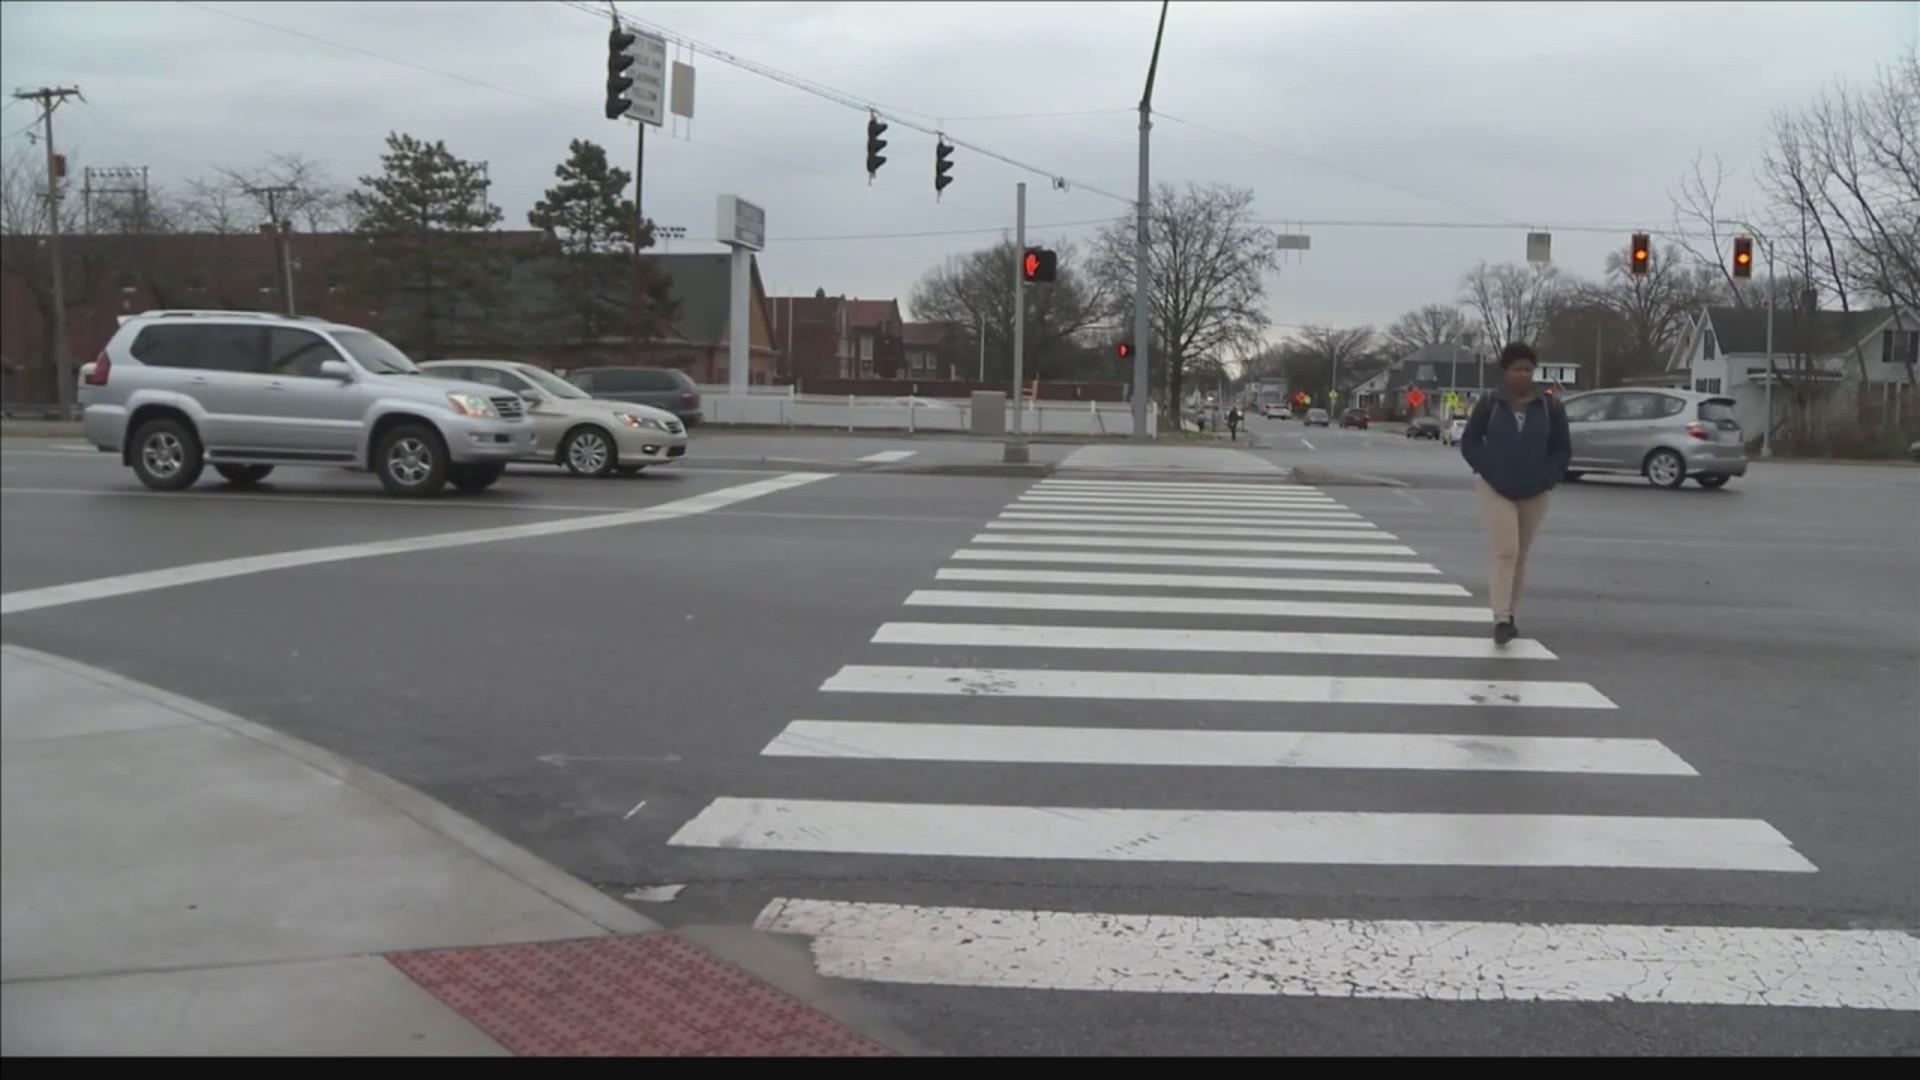 Efforts_continue_for_pedestrian_bridge_f_0_20190323005014